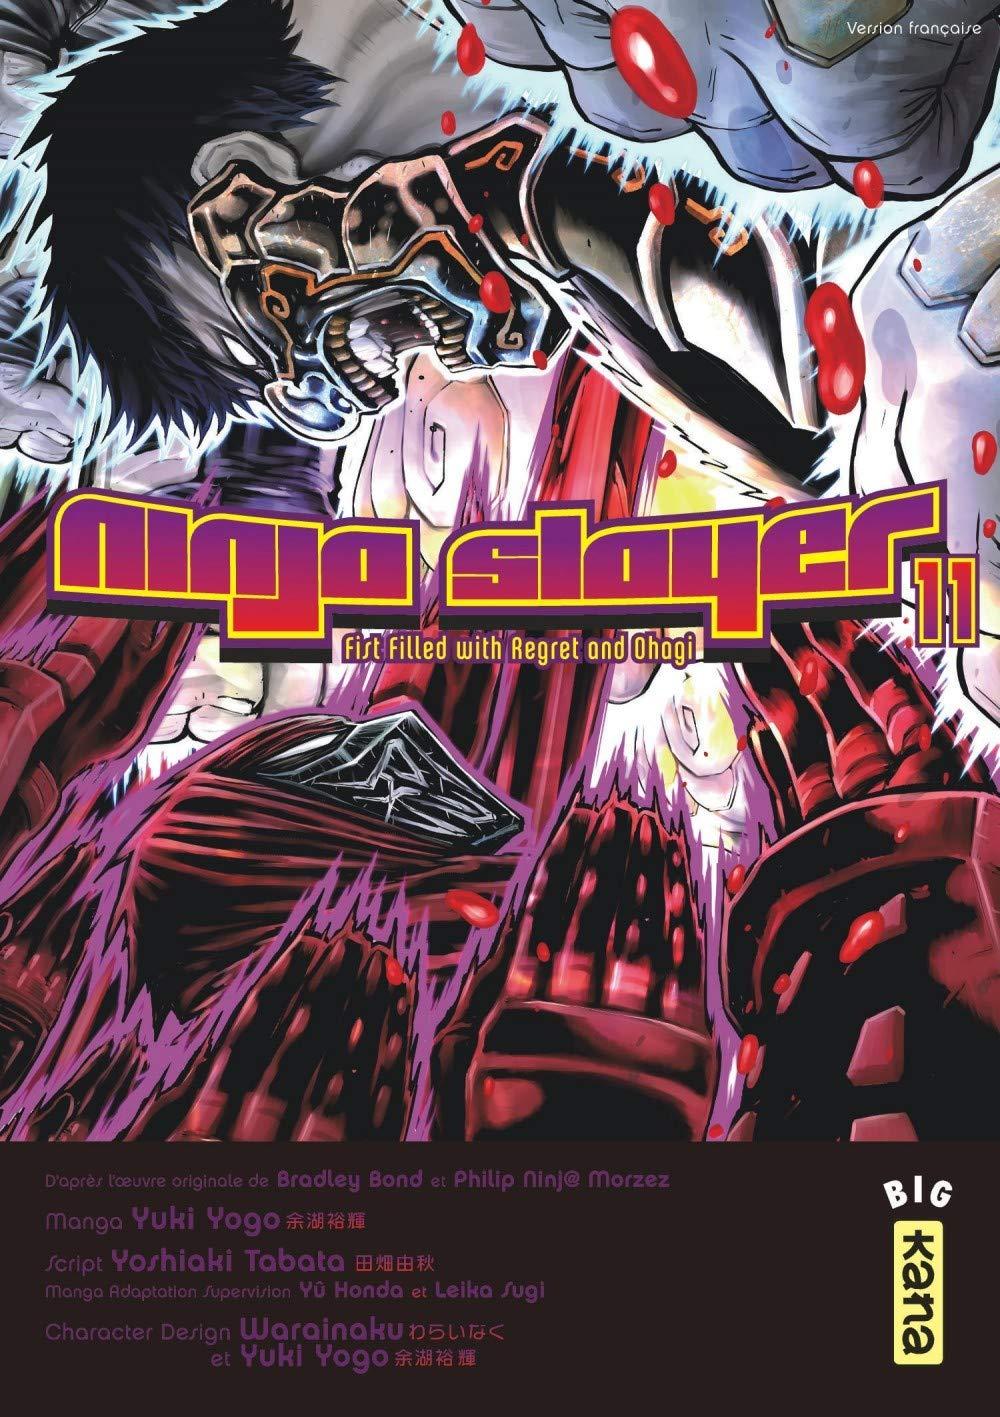 Ninja slayer, tome 11: Amazon.es: Yoshiaki Tabata, Yuki Yogo ...